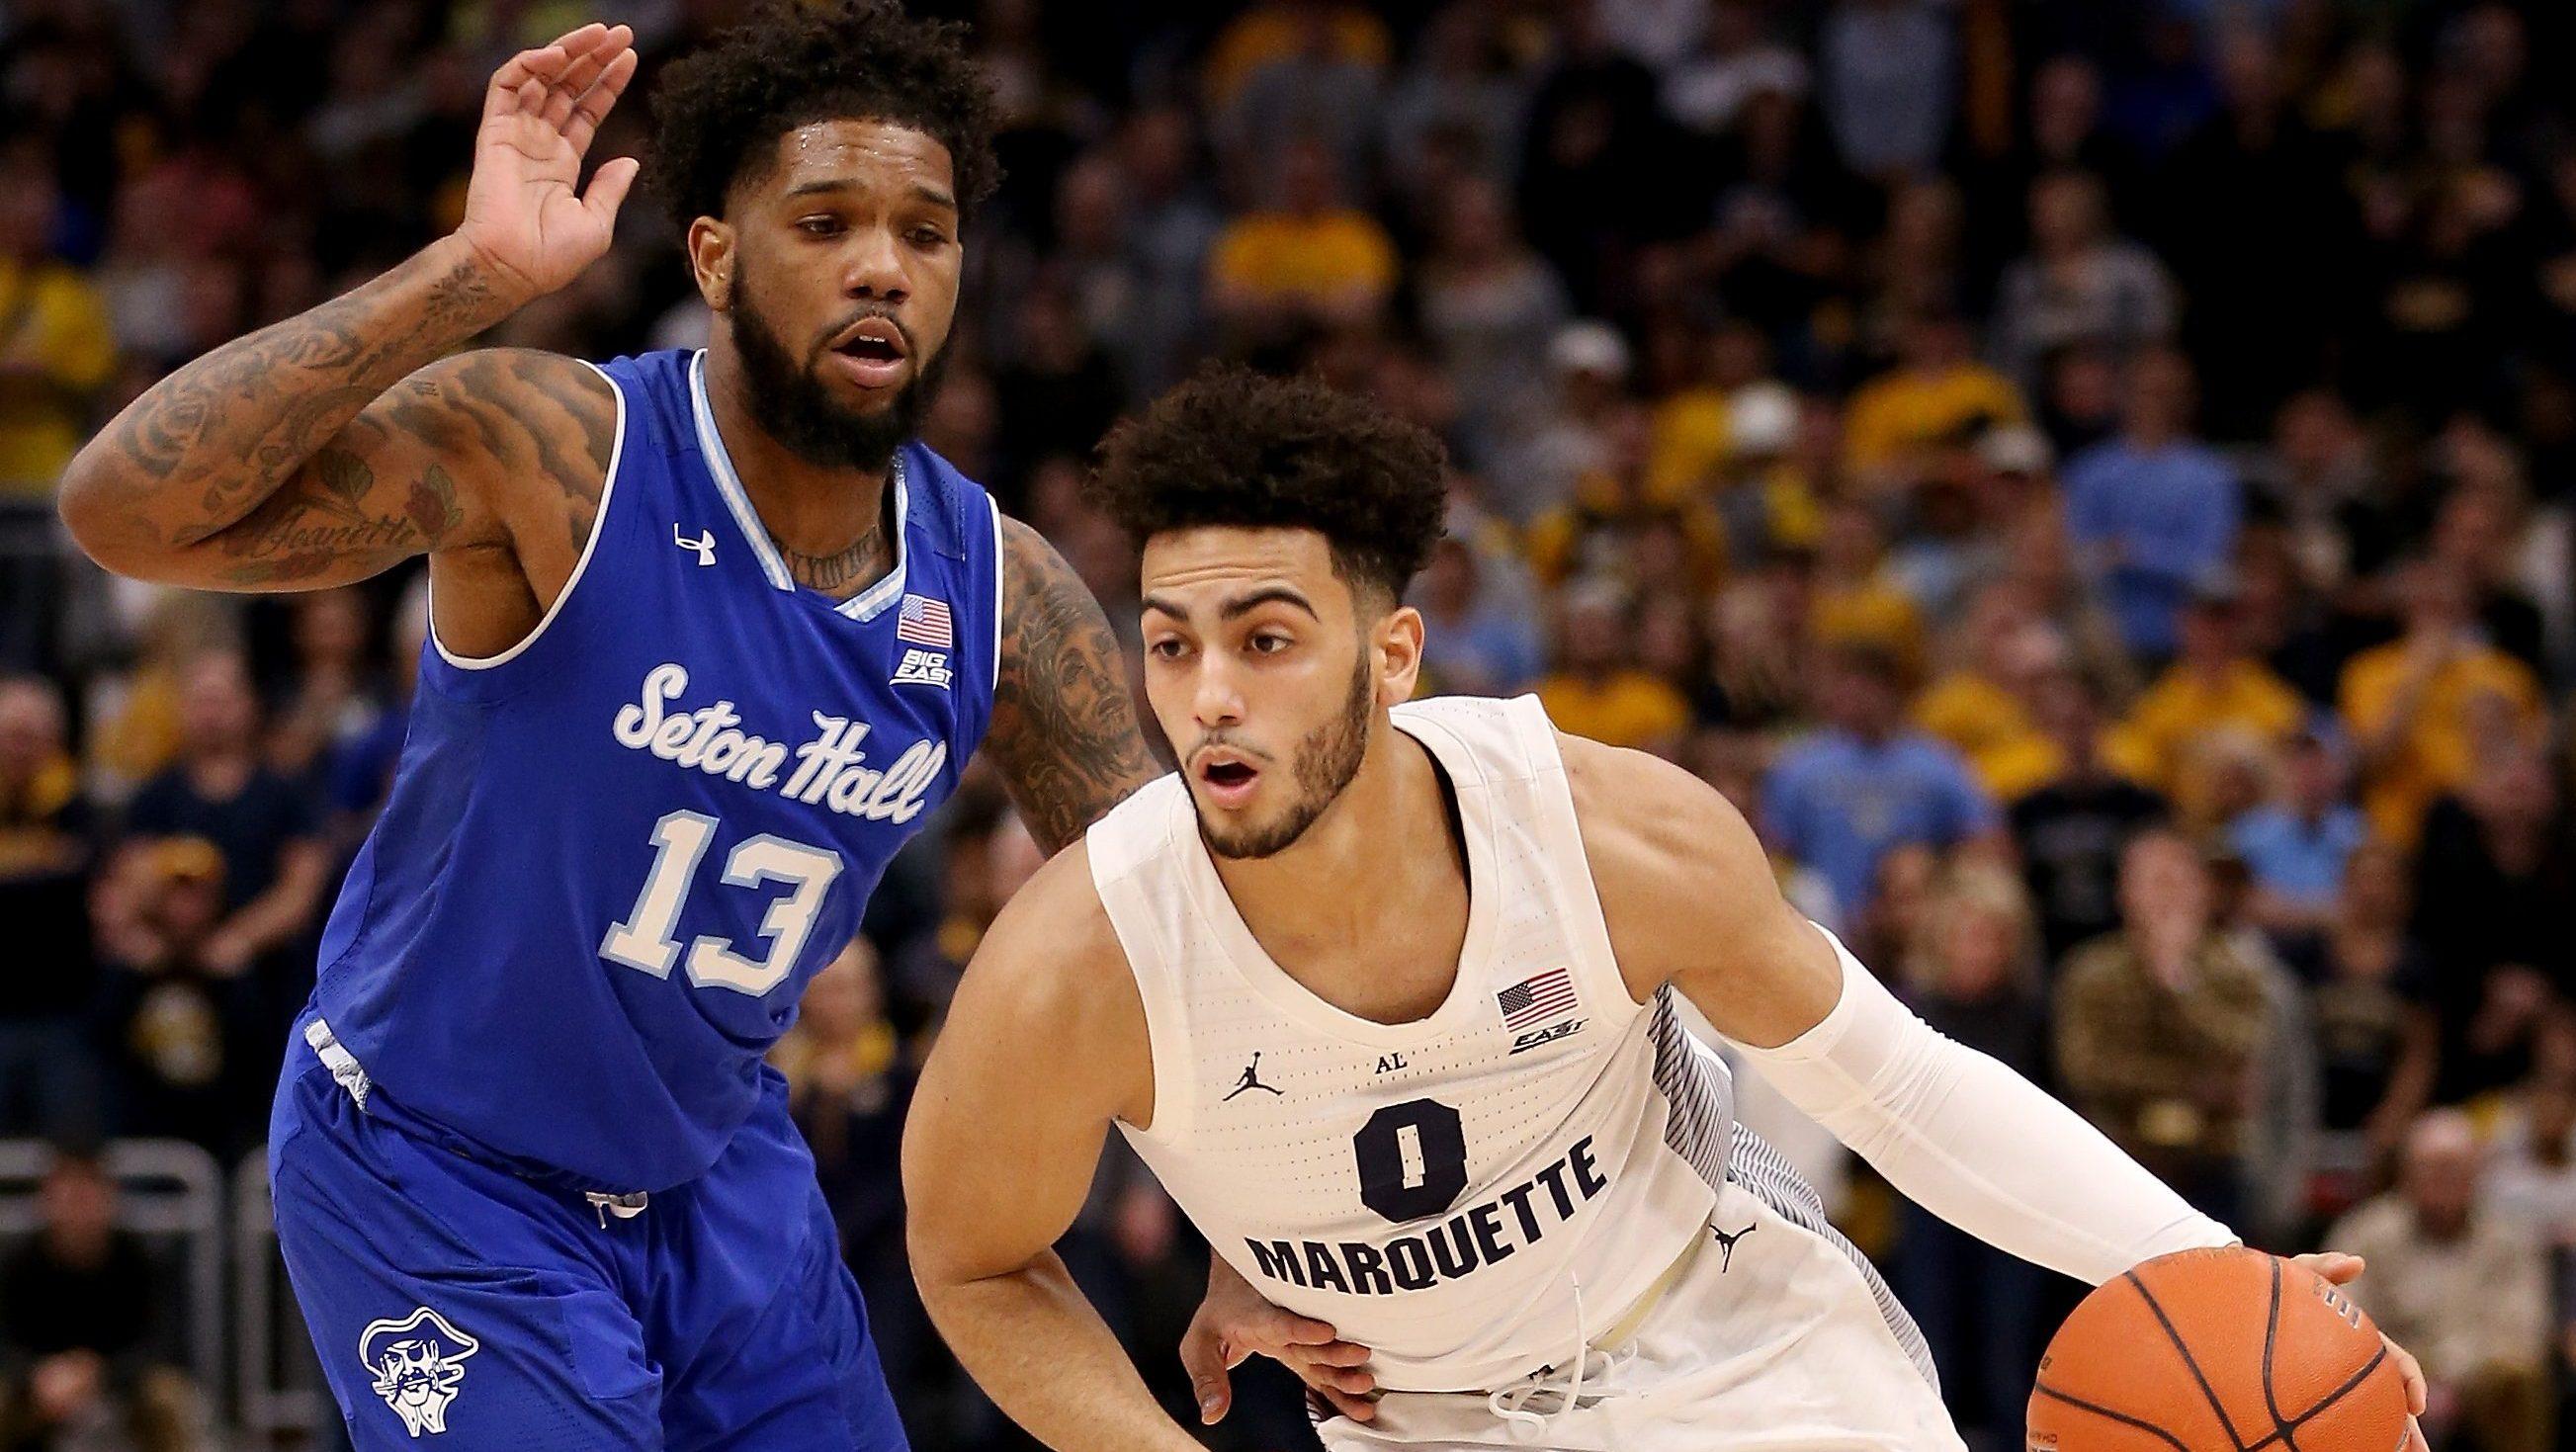 2019-20 NBC Sports College Basketball Preseason All-America Teams ...